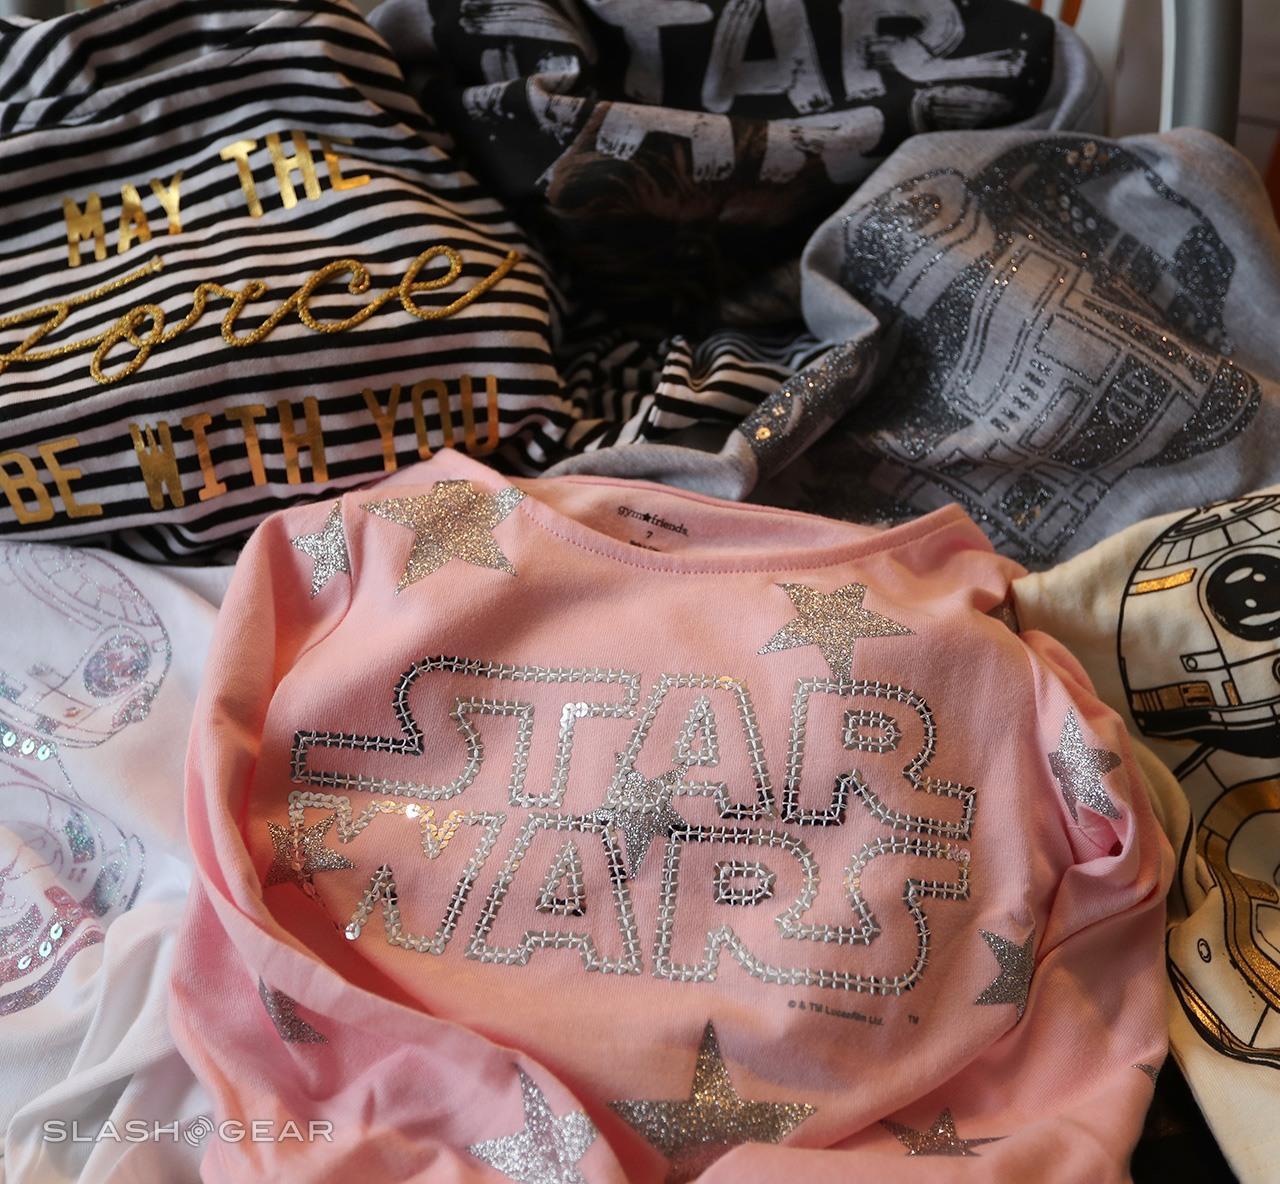 starwars_shirts_gymboree